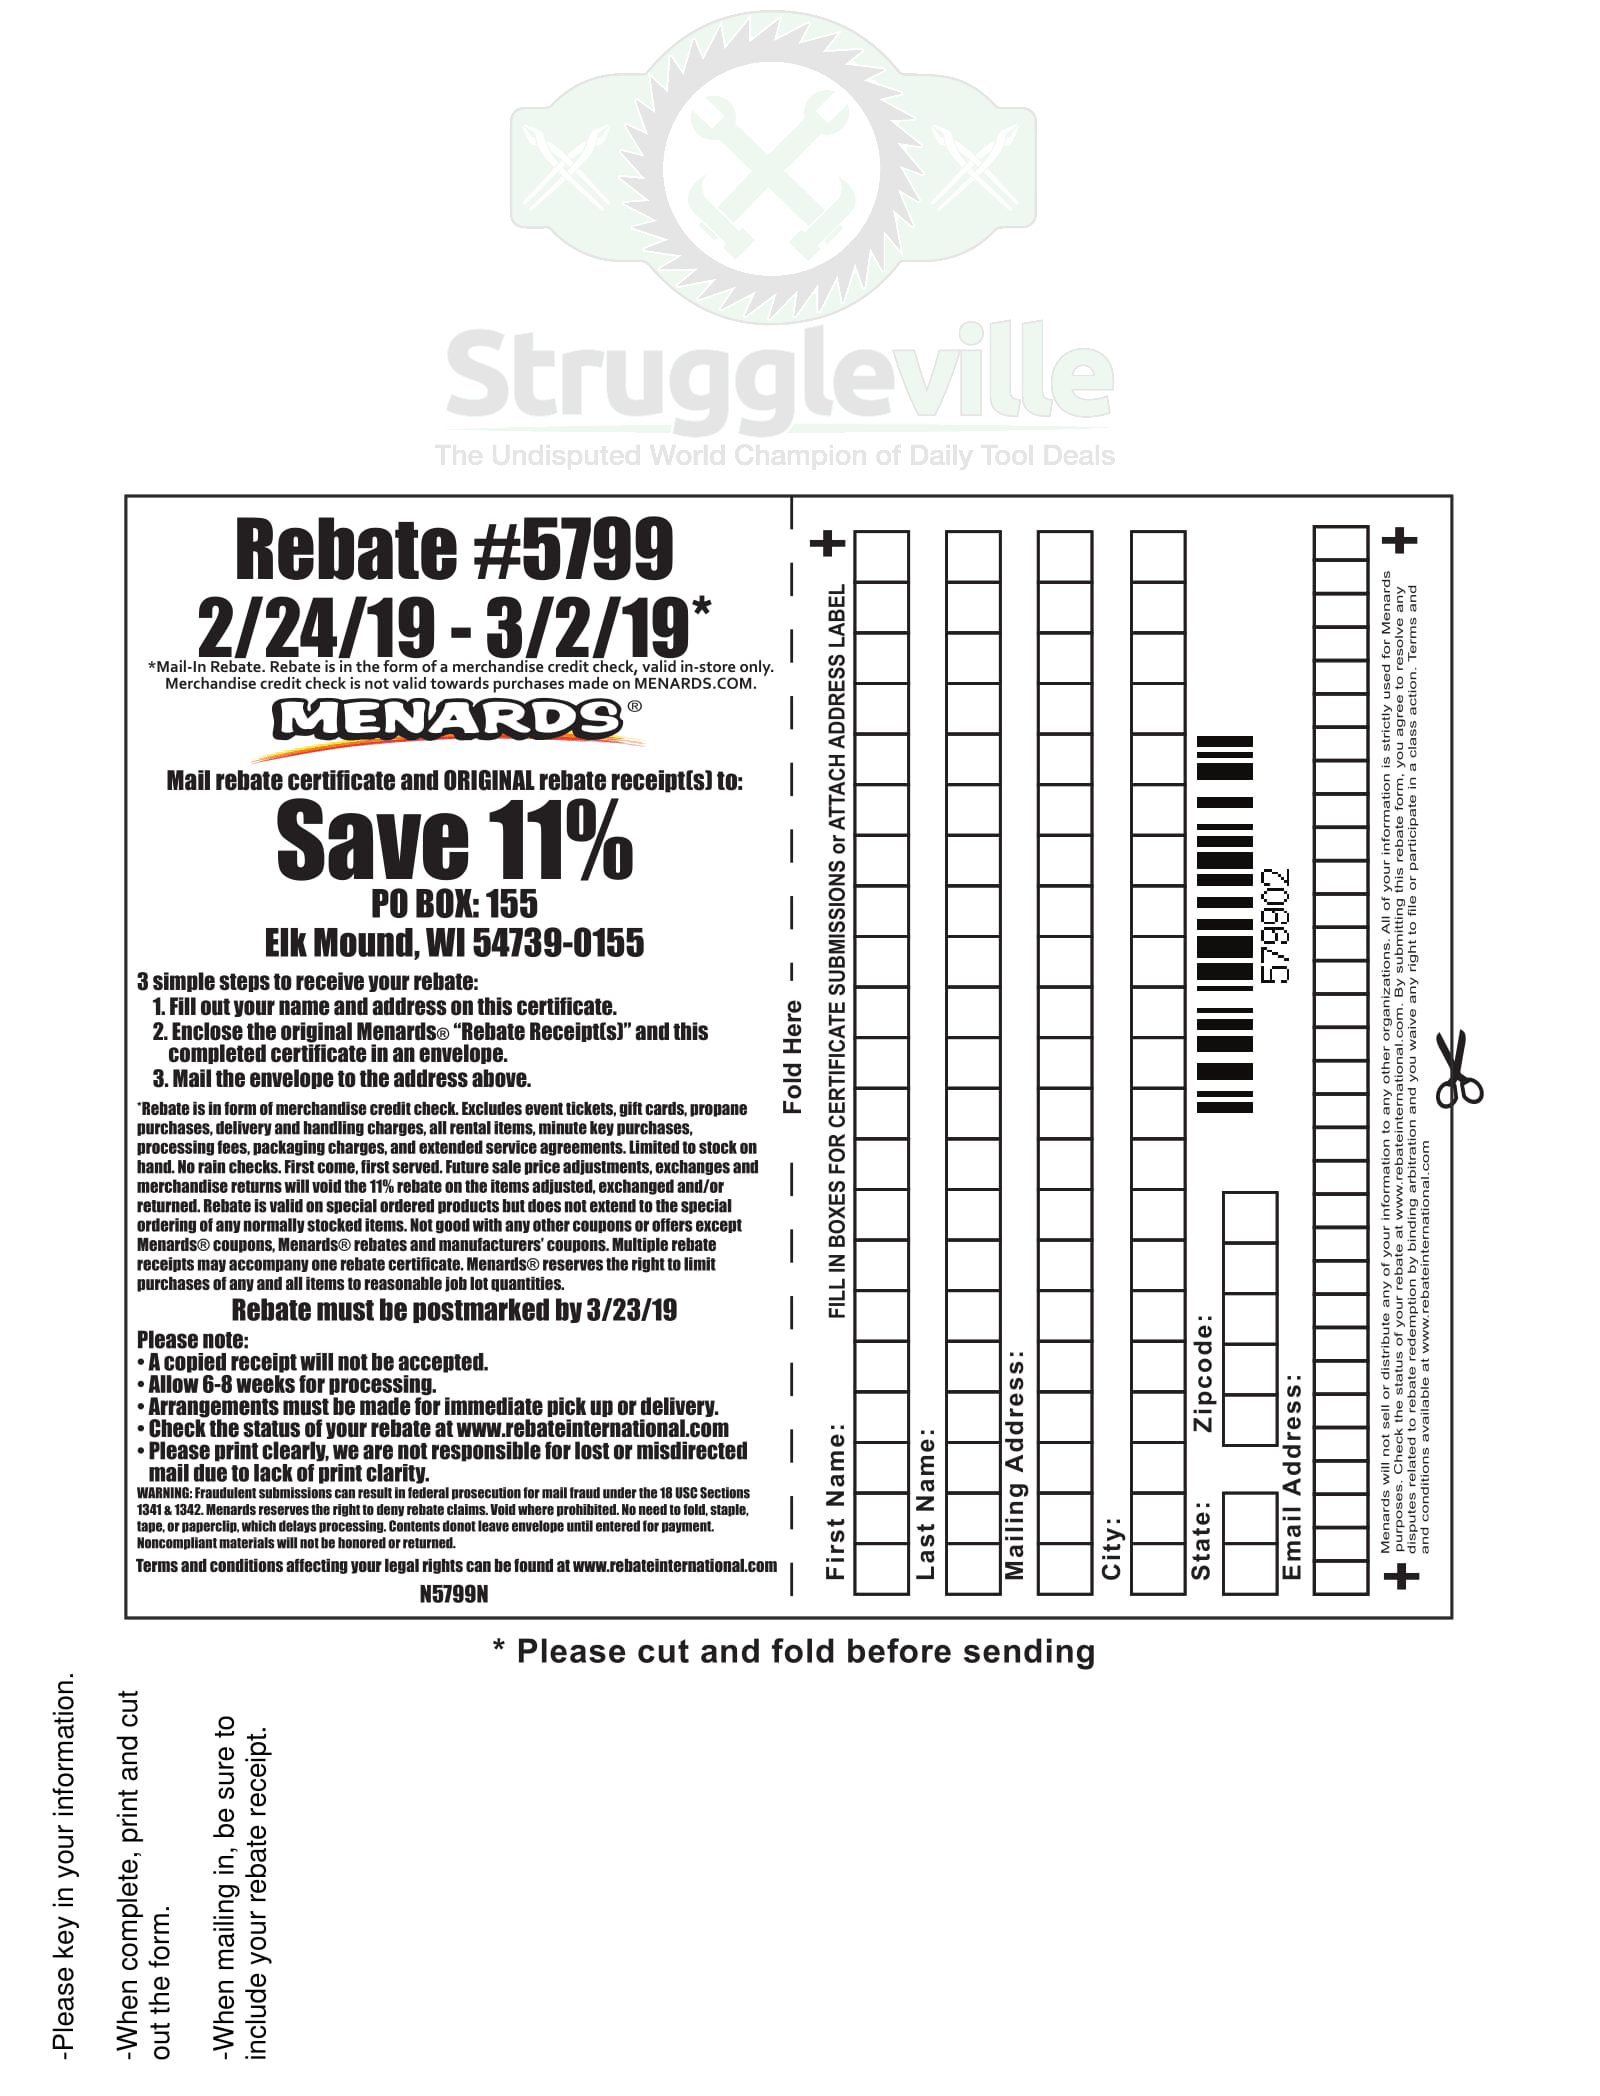 Menards Rebate Form To Print